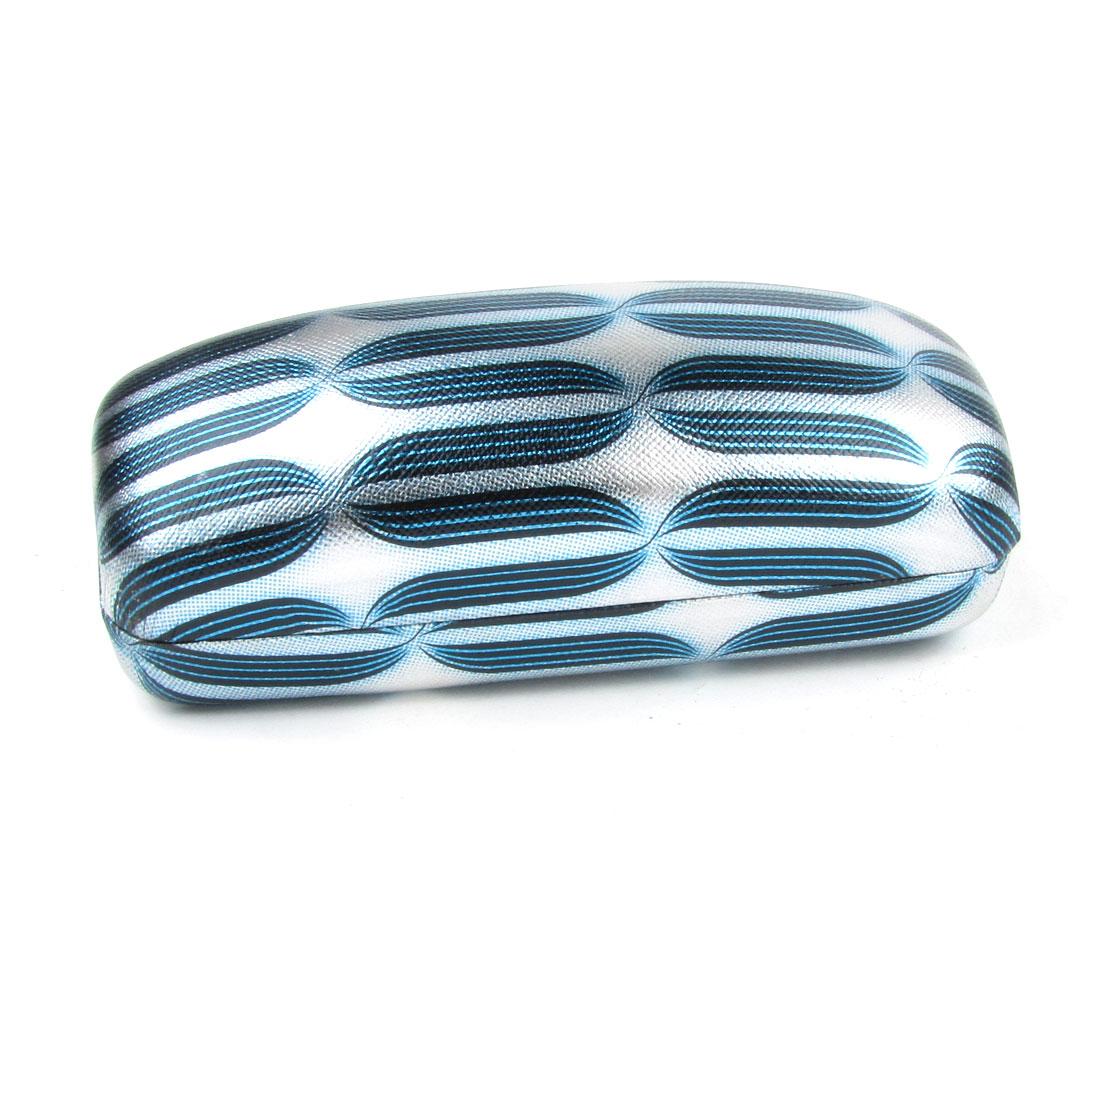 "6"" Long Black Blue Stripes Pattern Silver Tone Faux Leather Wrapped Glasses Box"